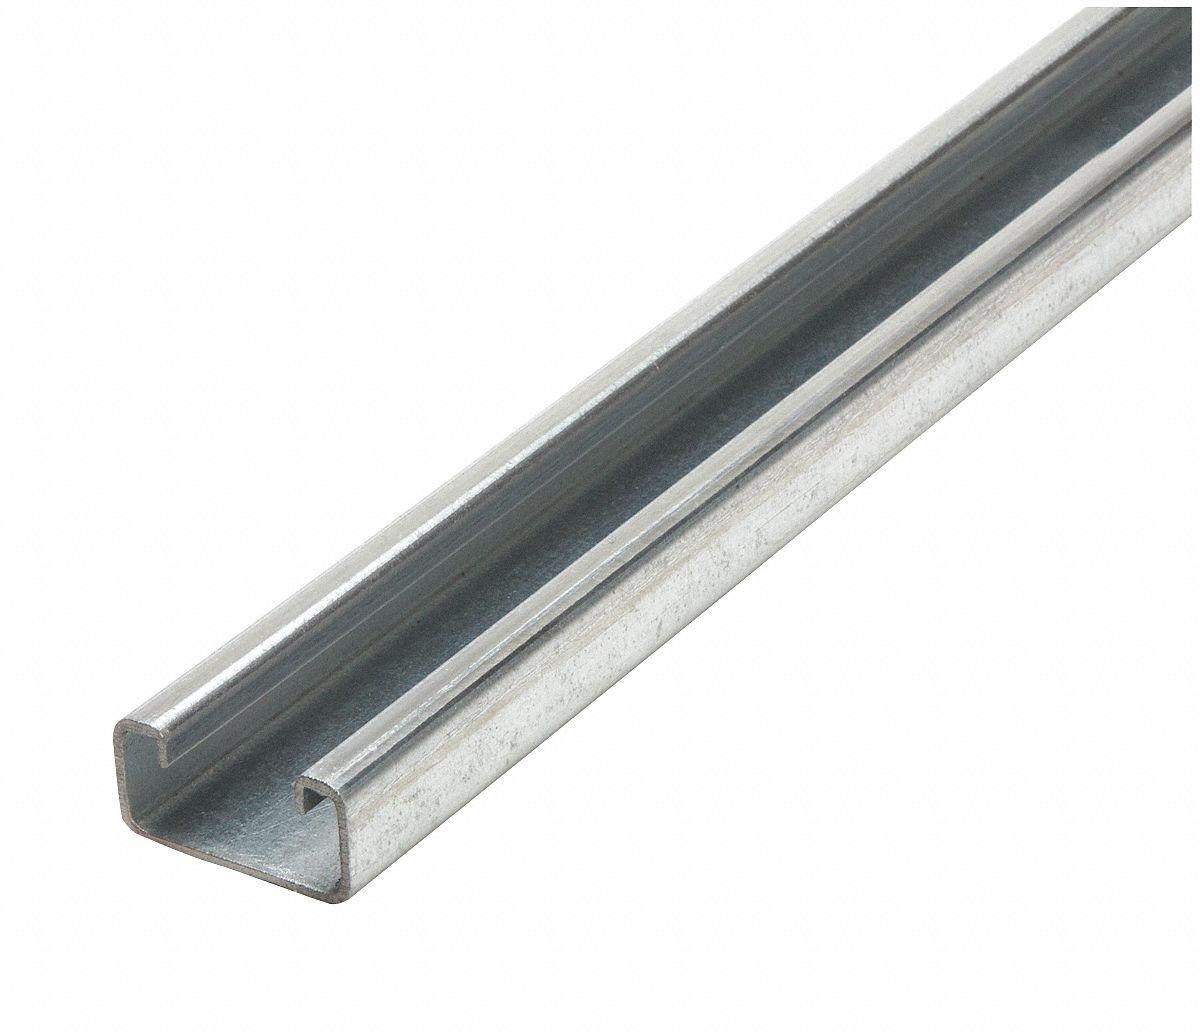 Solid Standard 1-5/8 x 13/16 Strut Channel, Pre-Galvanized Steel, 14 ga, 3 ft.